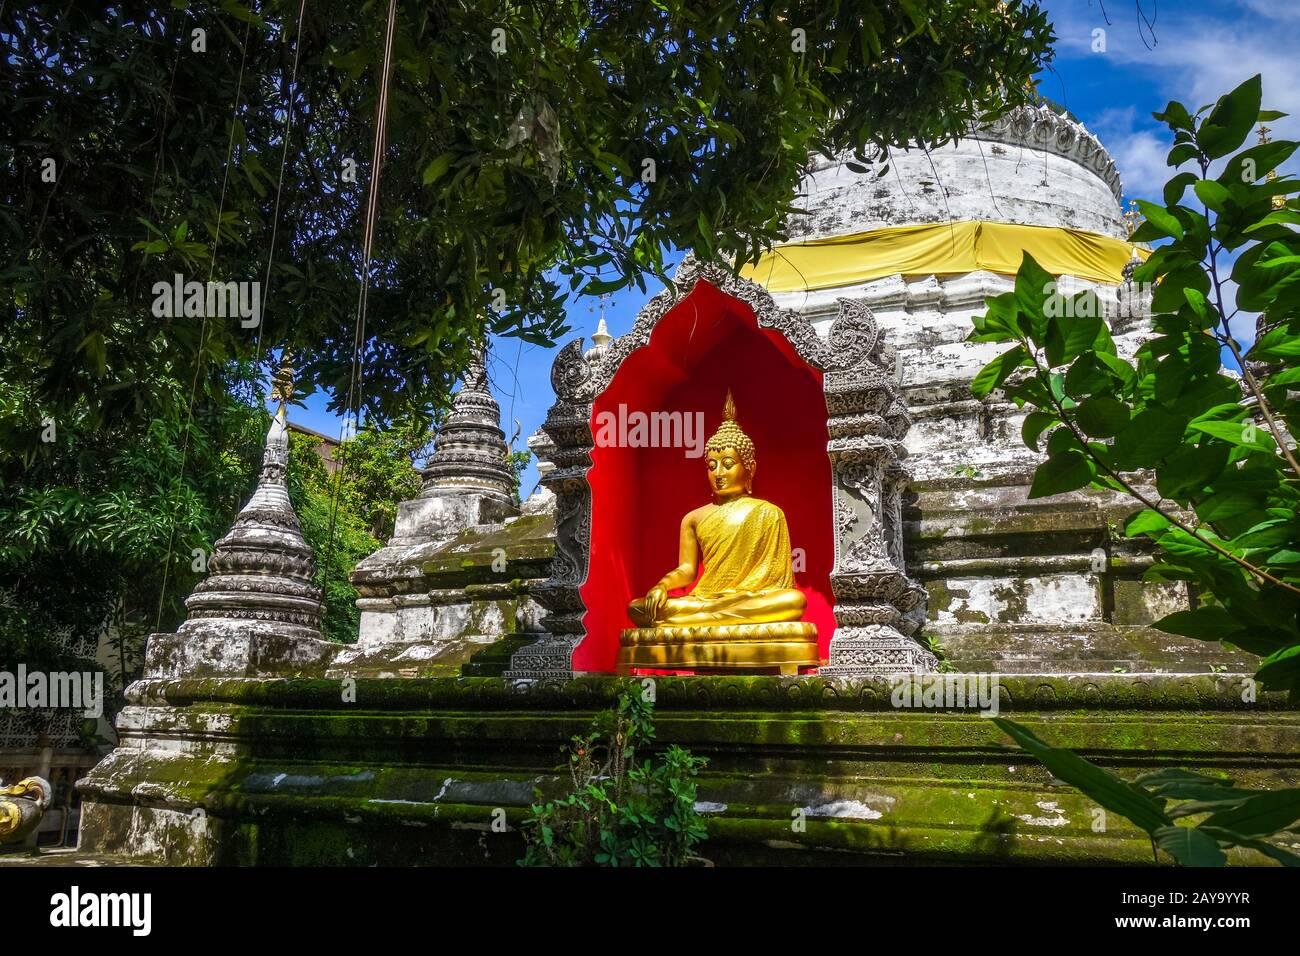 Wat Buppharam temple pagoda, Chiang Mai, Thailand Stock Photo